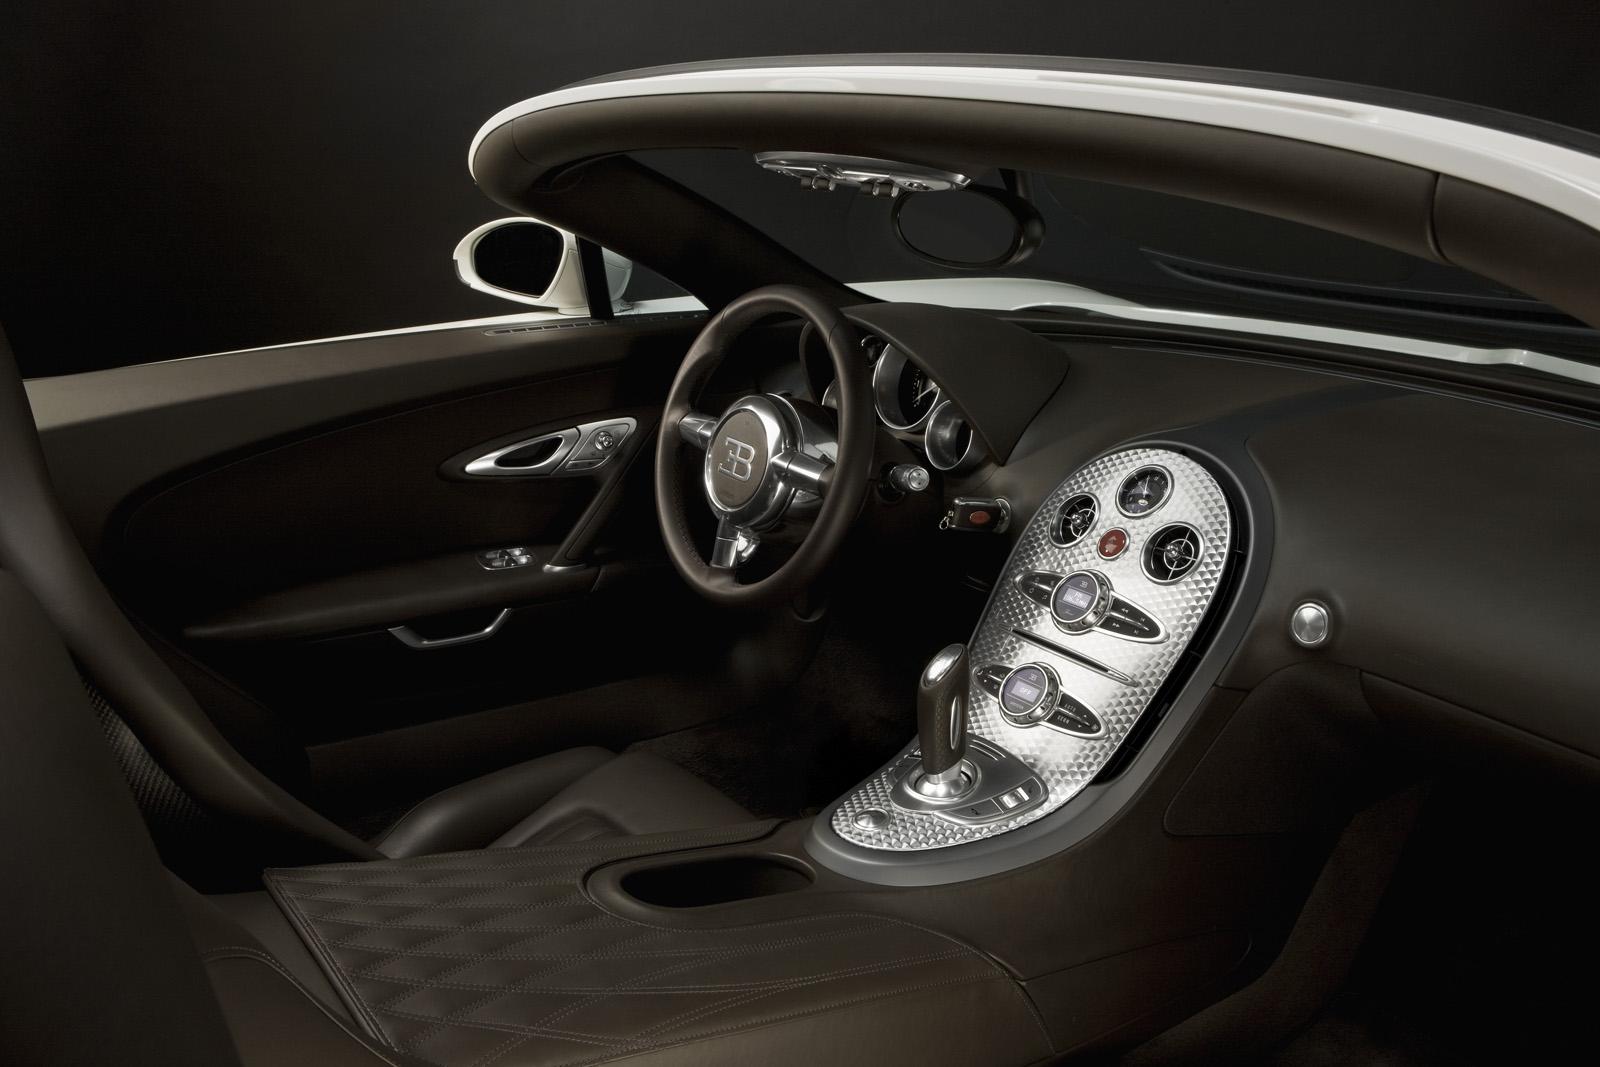 cool cars bugatti veyron interior. Black Bedroom Furniture Sets. Home Design Ideas